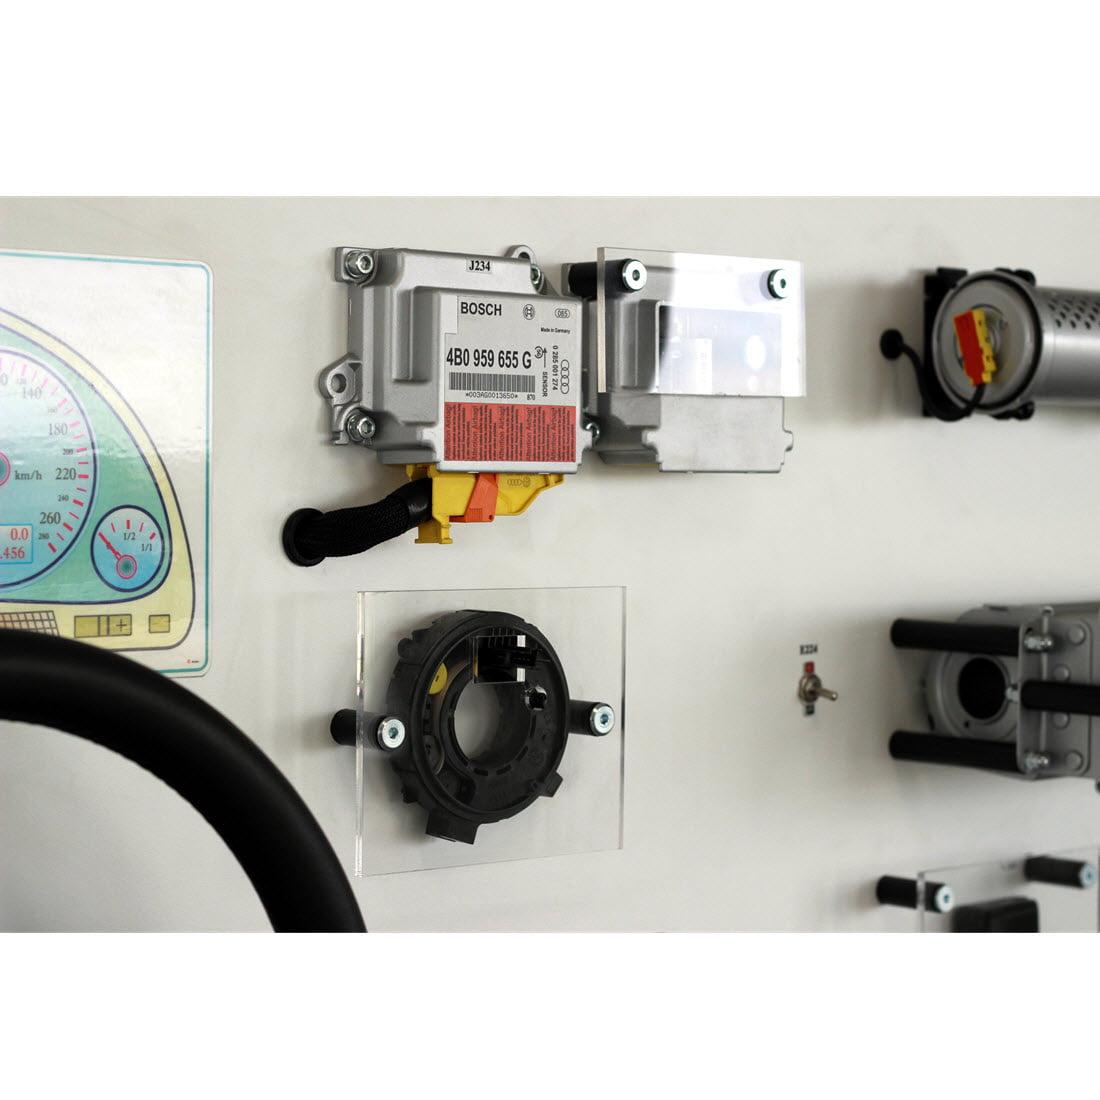 Espace 2.2 dci testeur simulateur airbag simulator